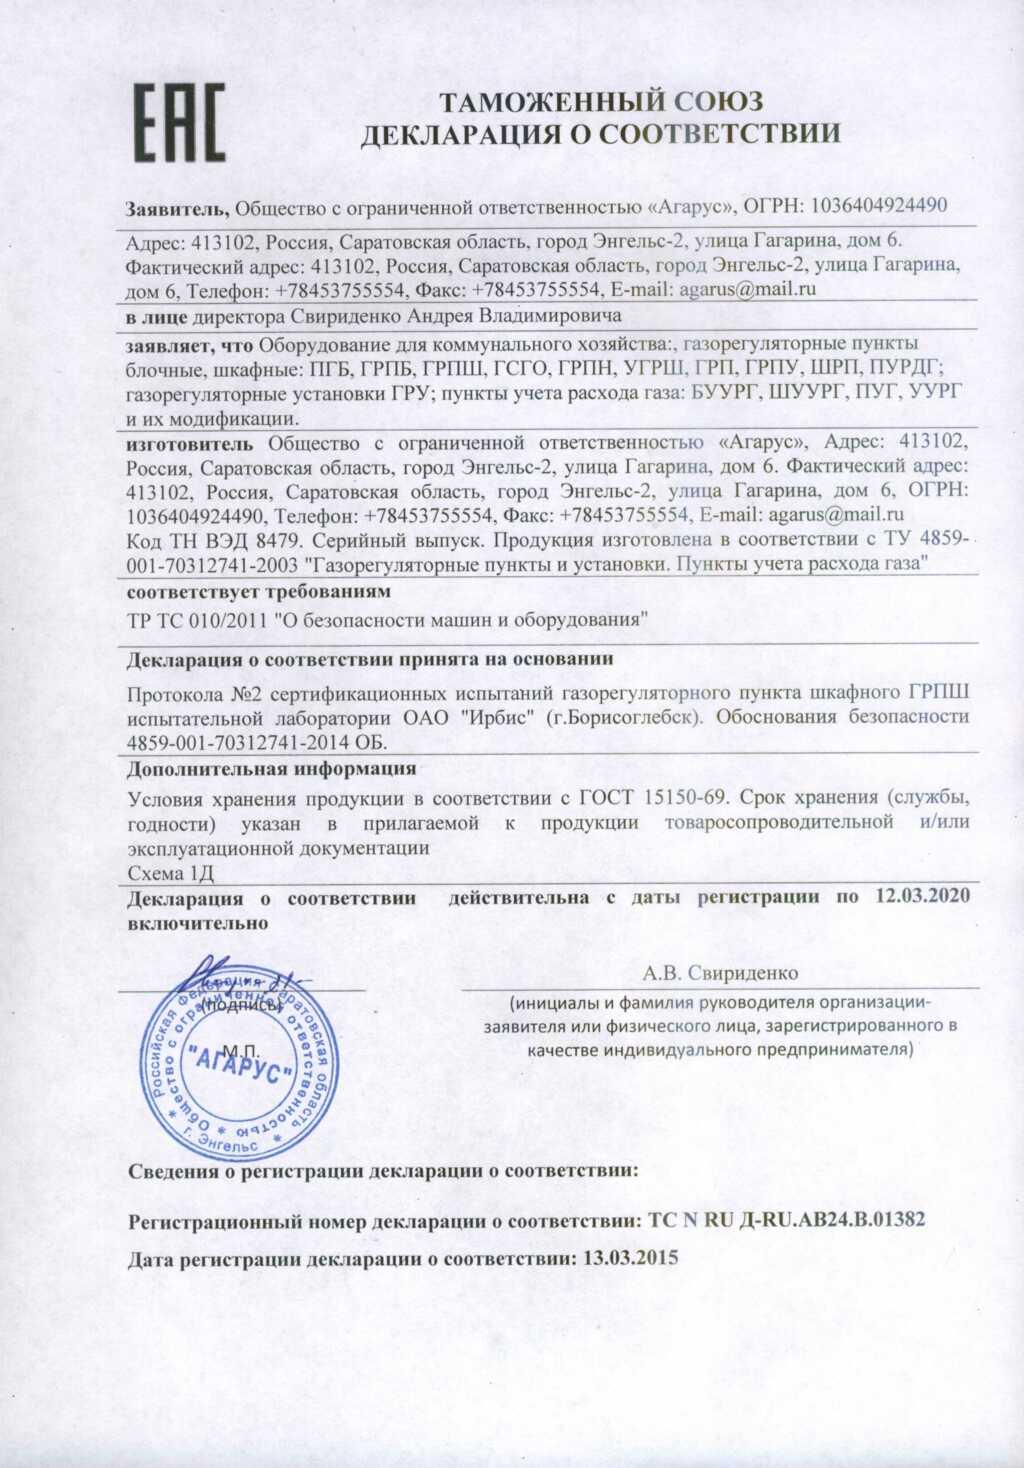 сертификат и разрешение грпш 10мс 1